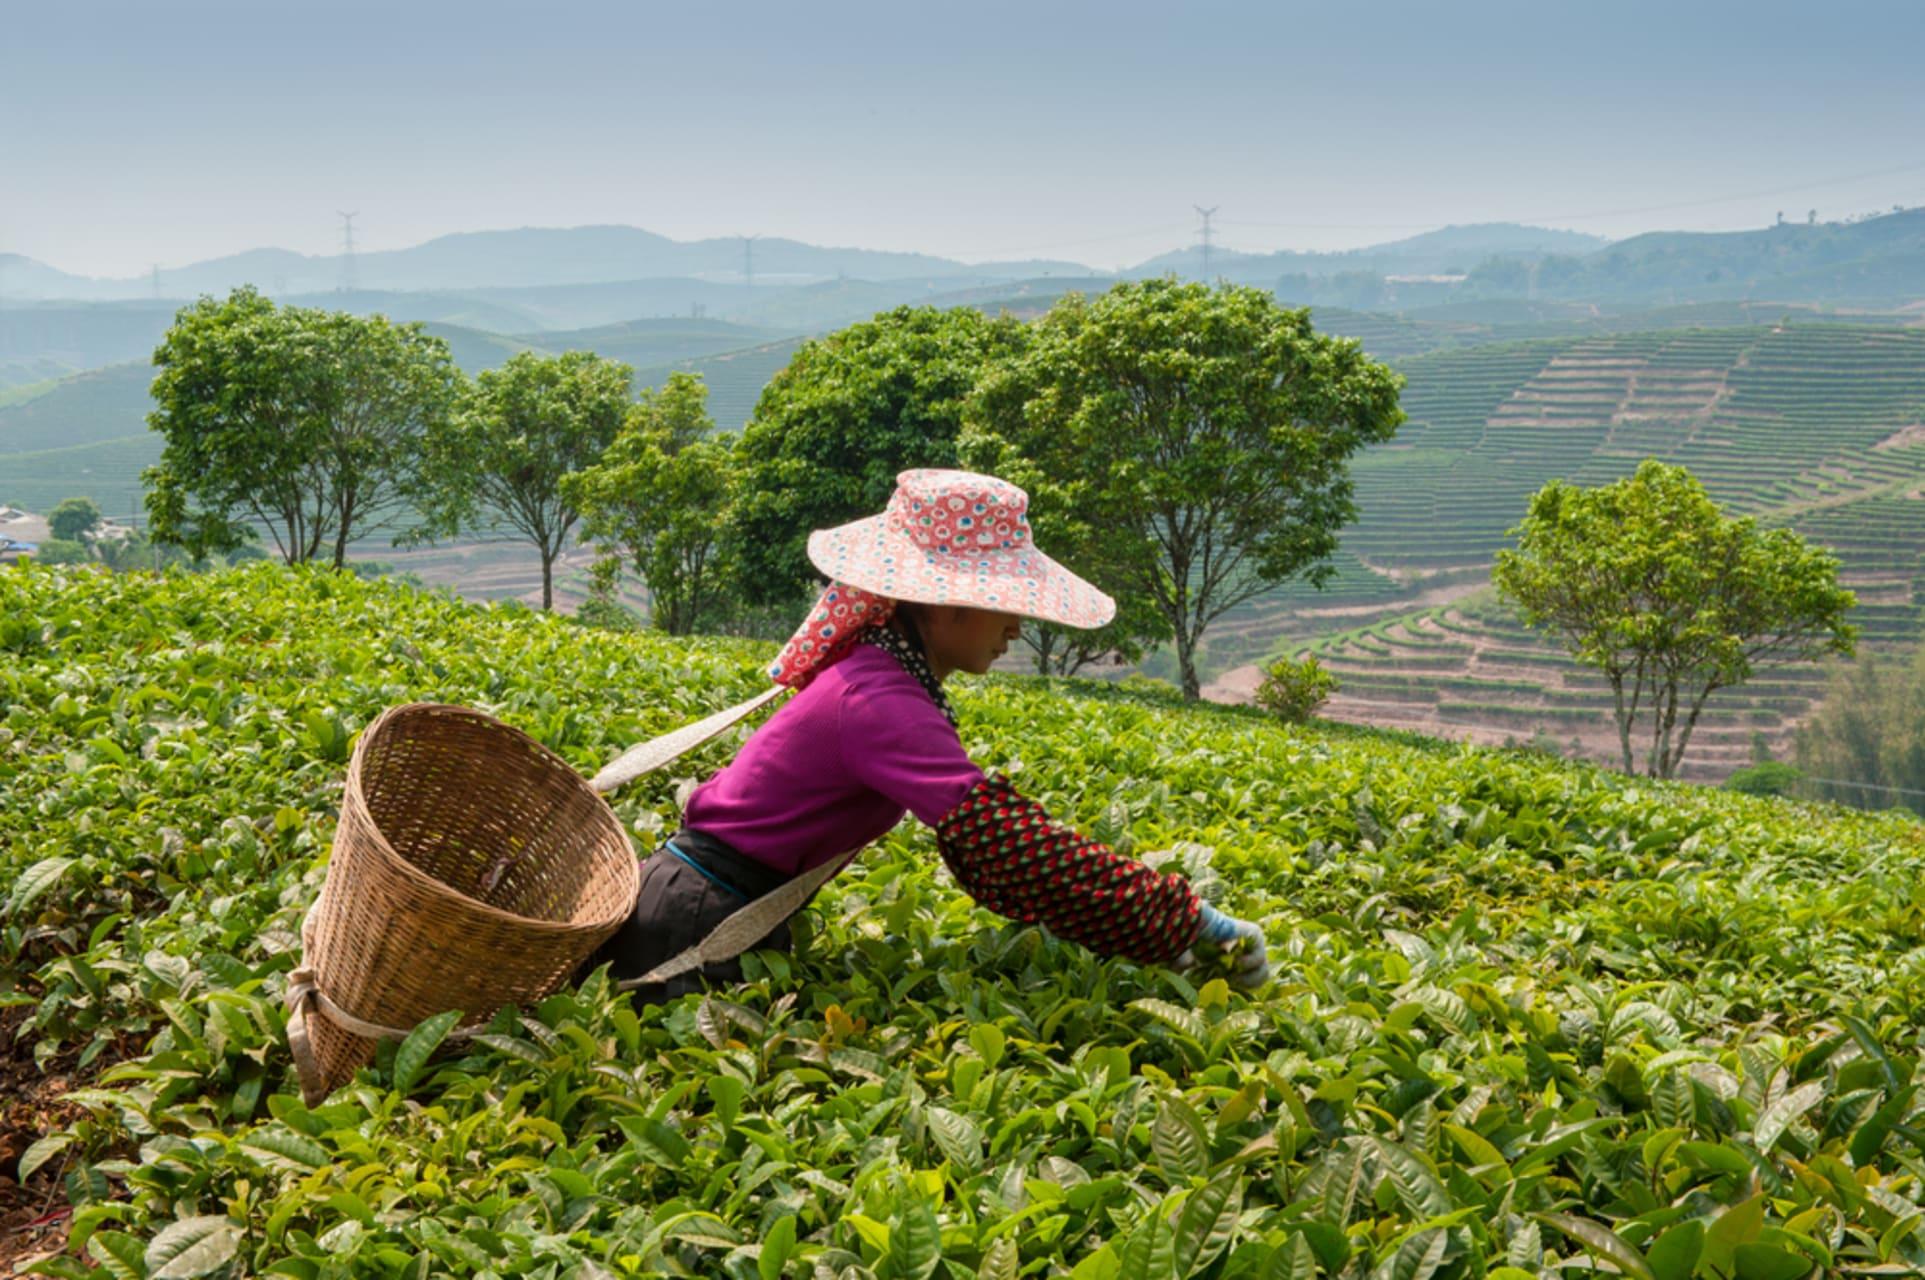 Guilin - Guilin Tea Plantation and Mount Yao